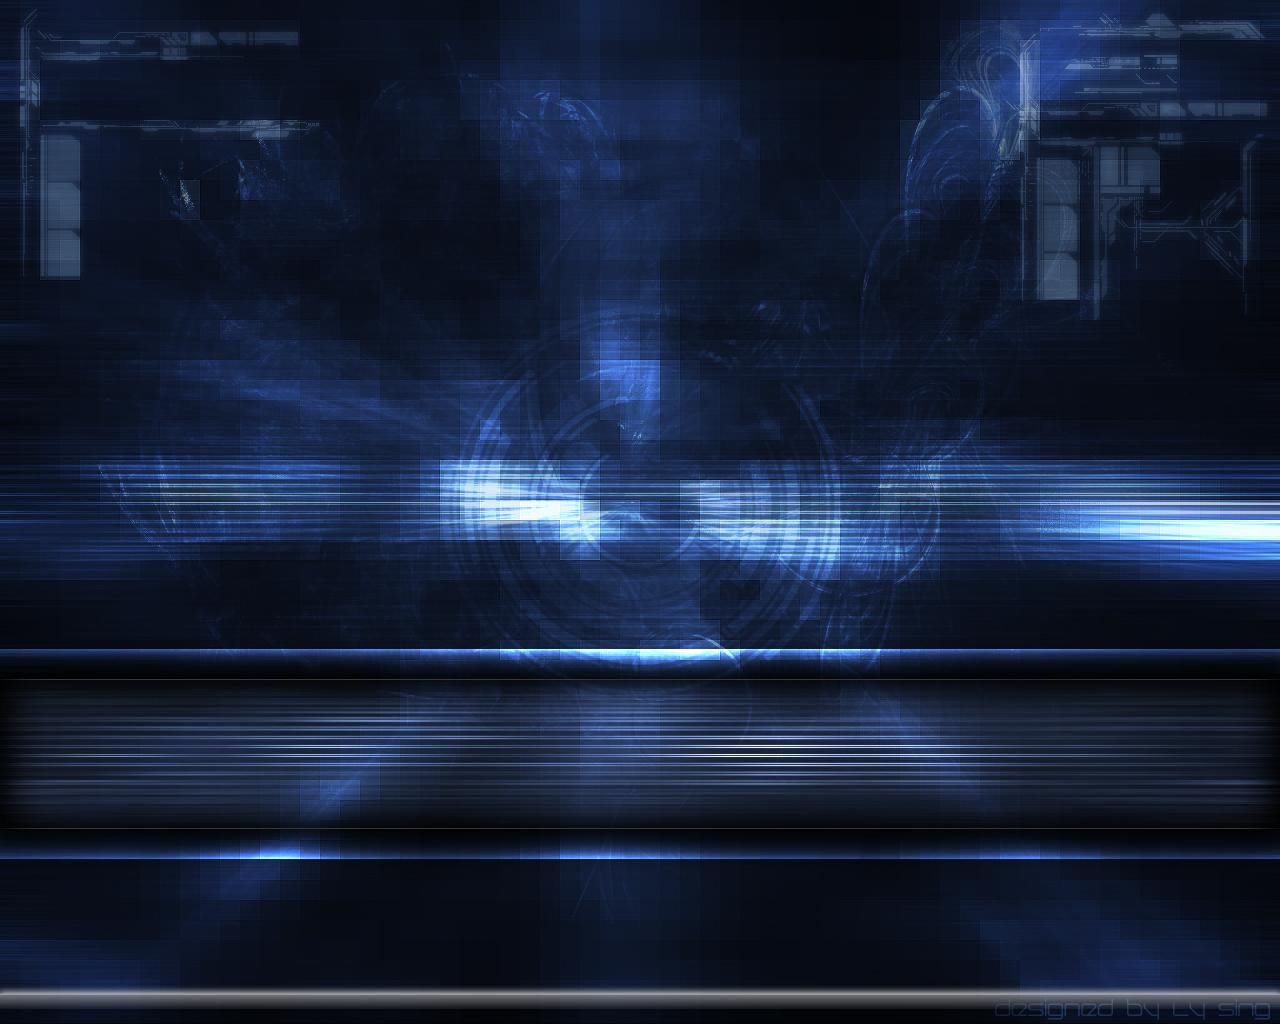 Blue Techno Wallpaper - WallpaperSafari